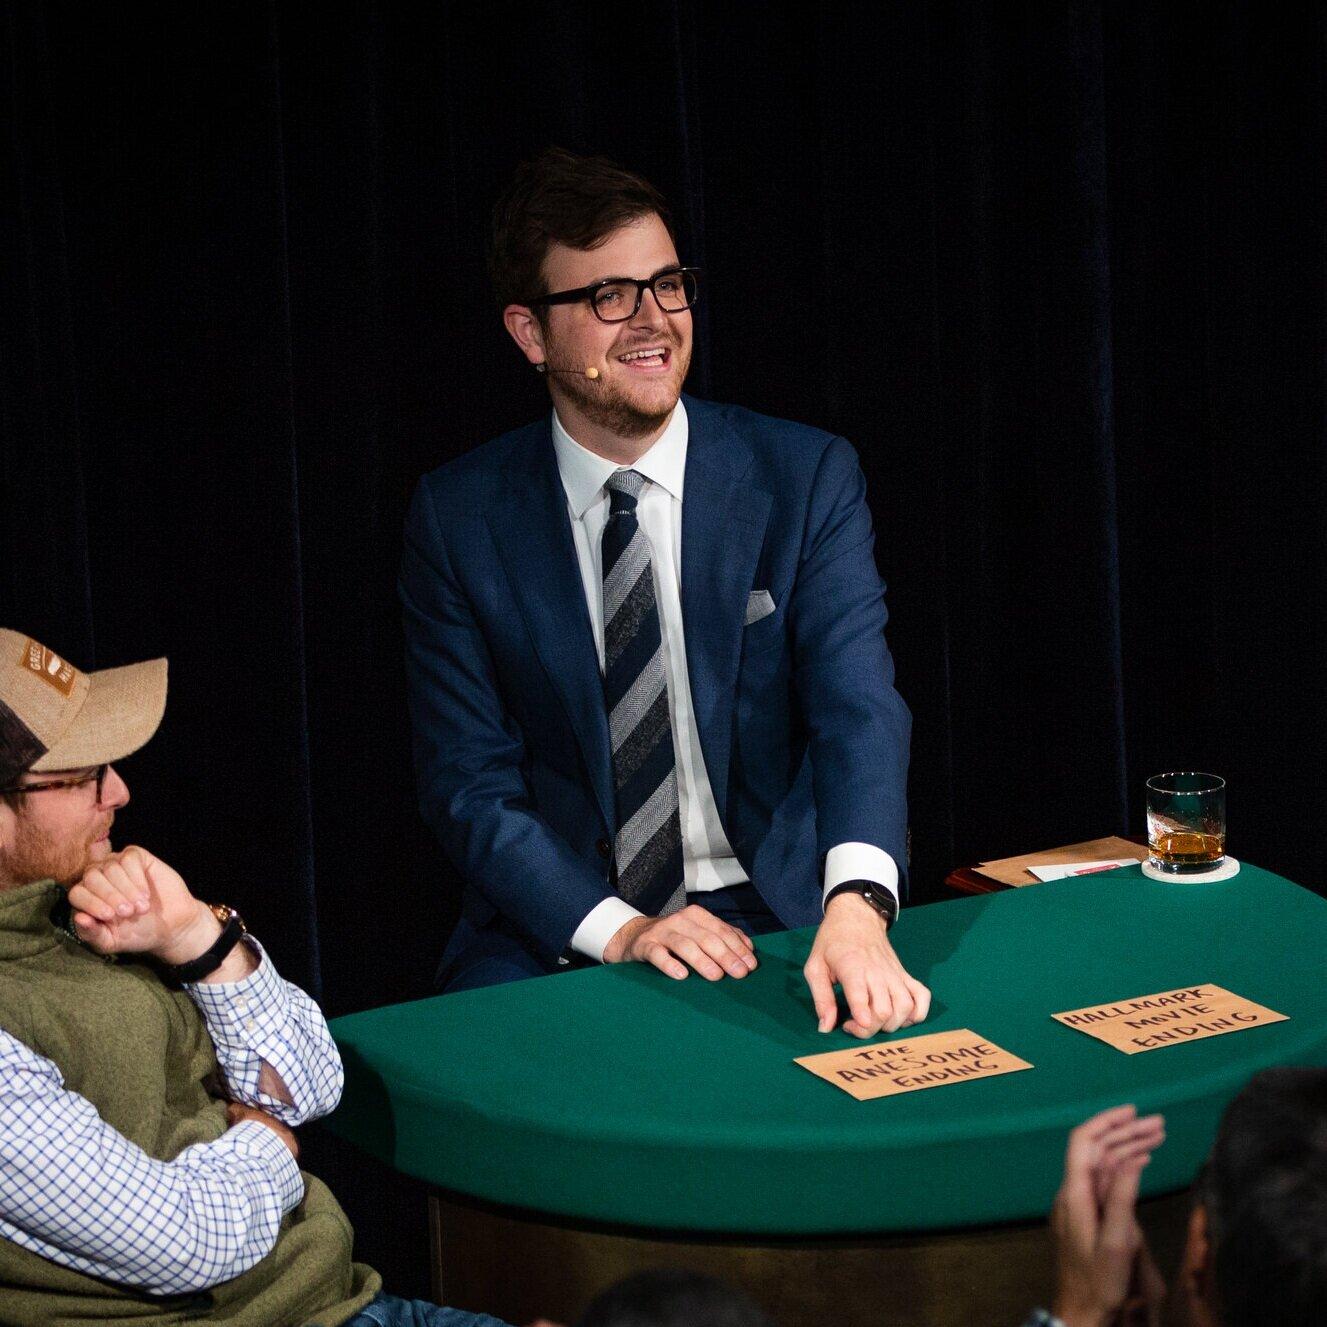 Ryan Plunkett - Thursday - Saturday Nights